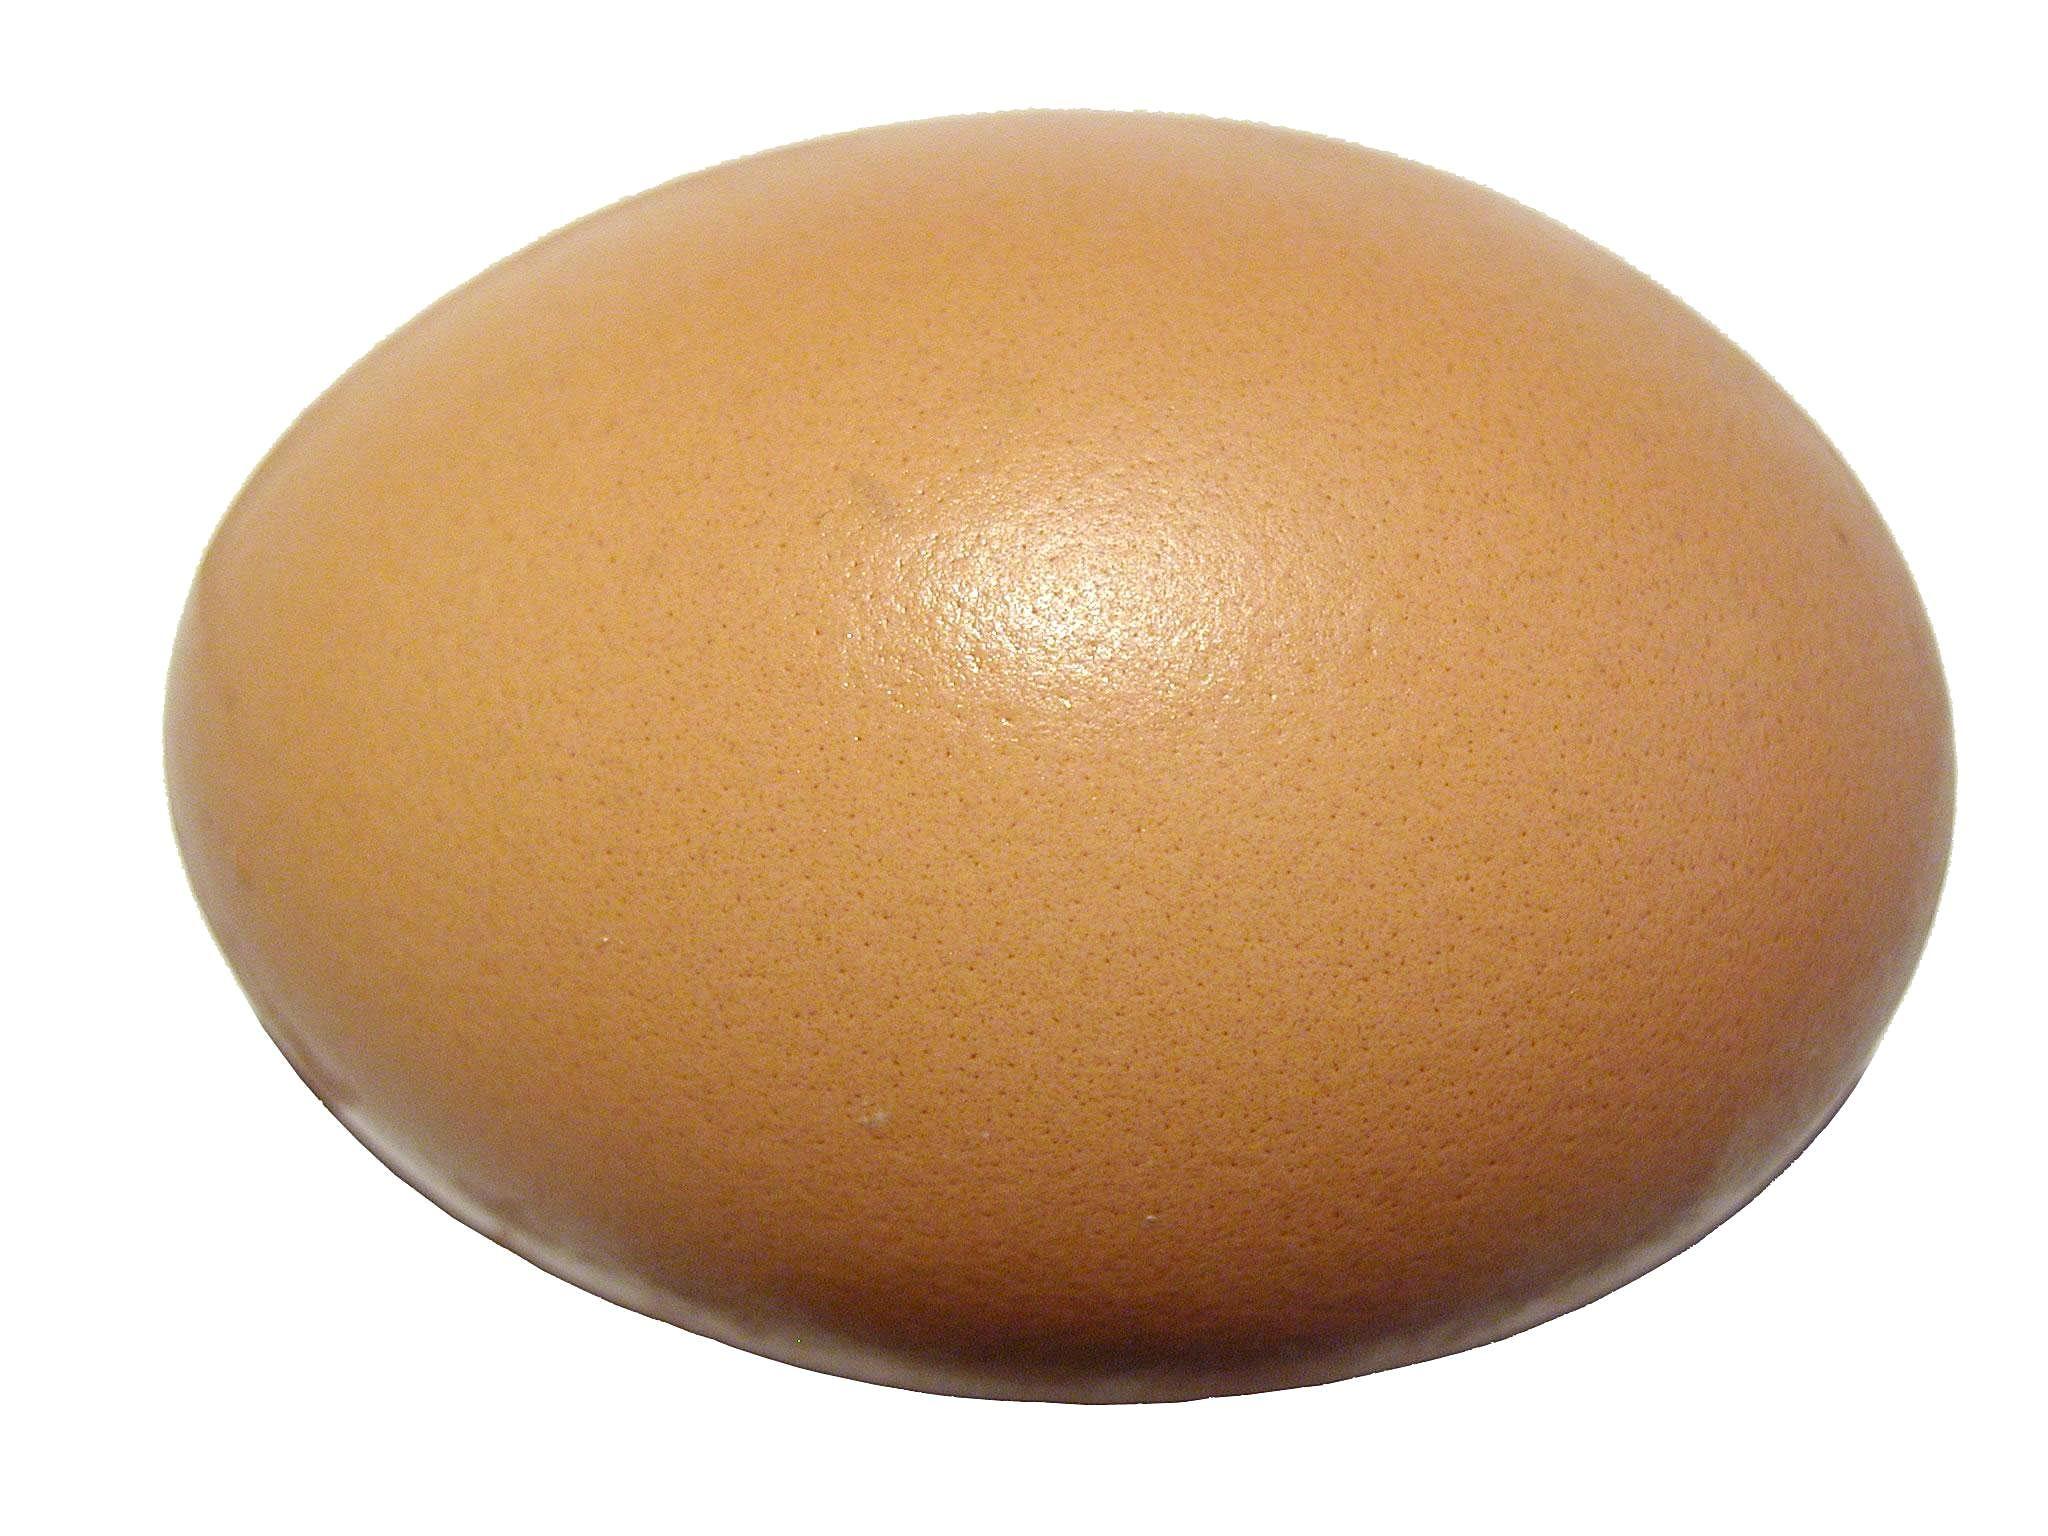 Egg - raw